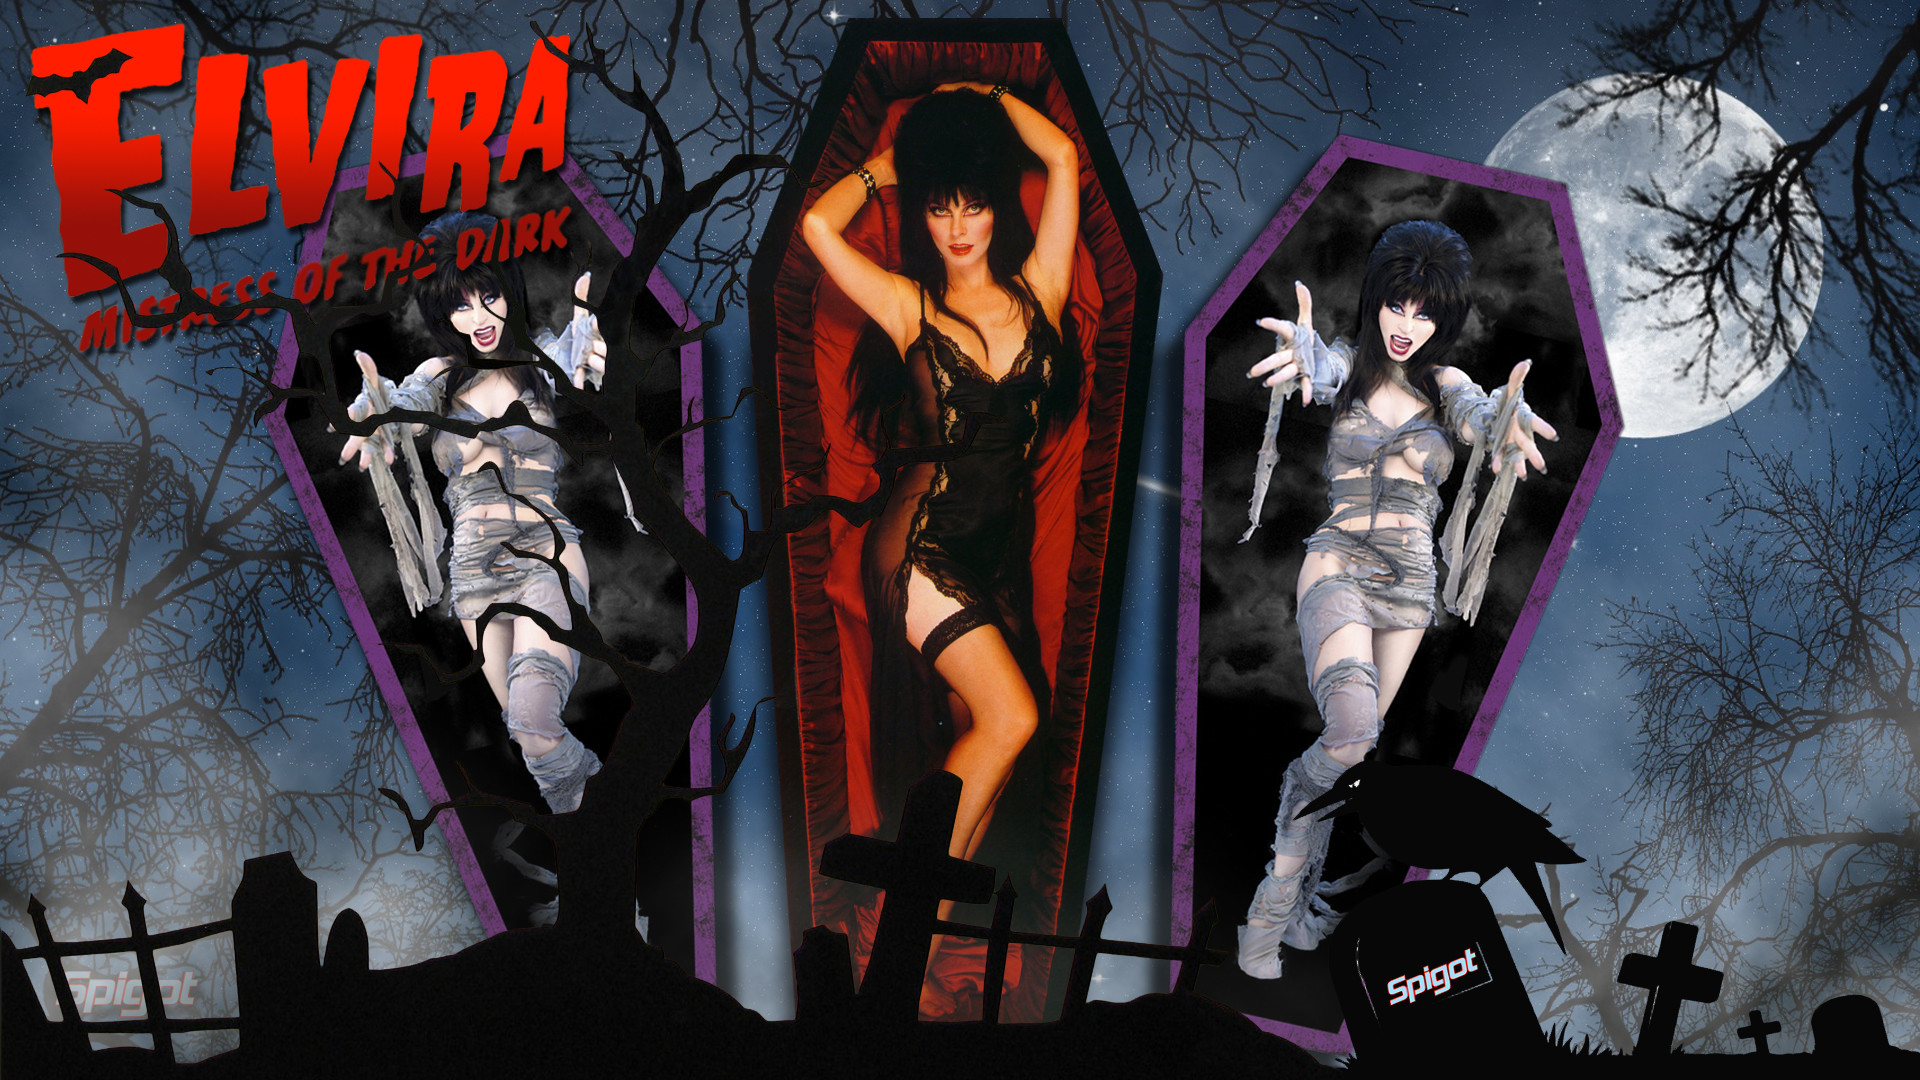 Elvira Mistress Of The Dark Wallpaper 77 Pictures